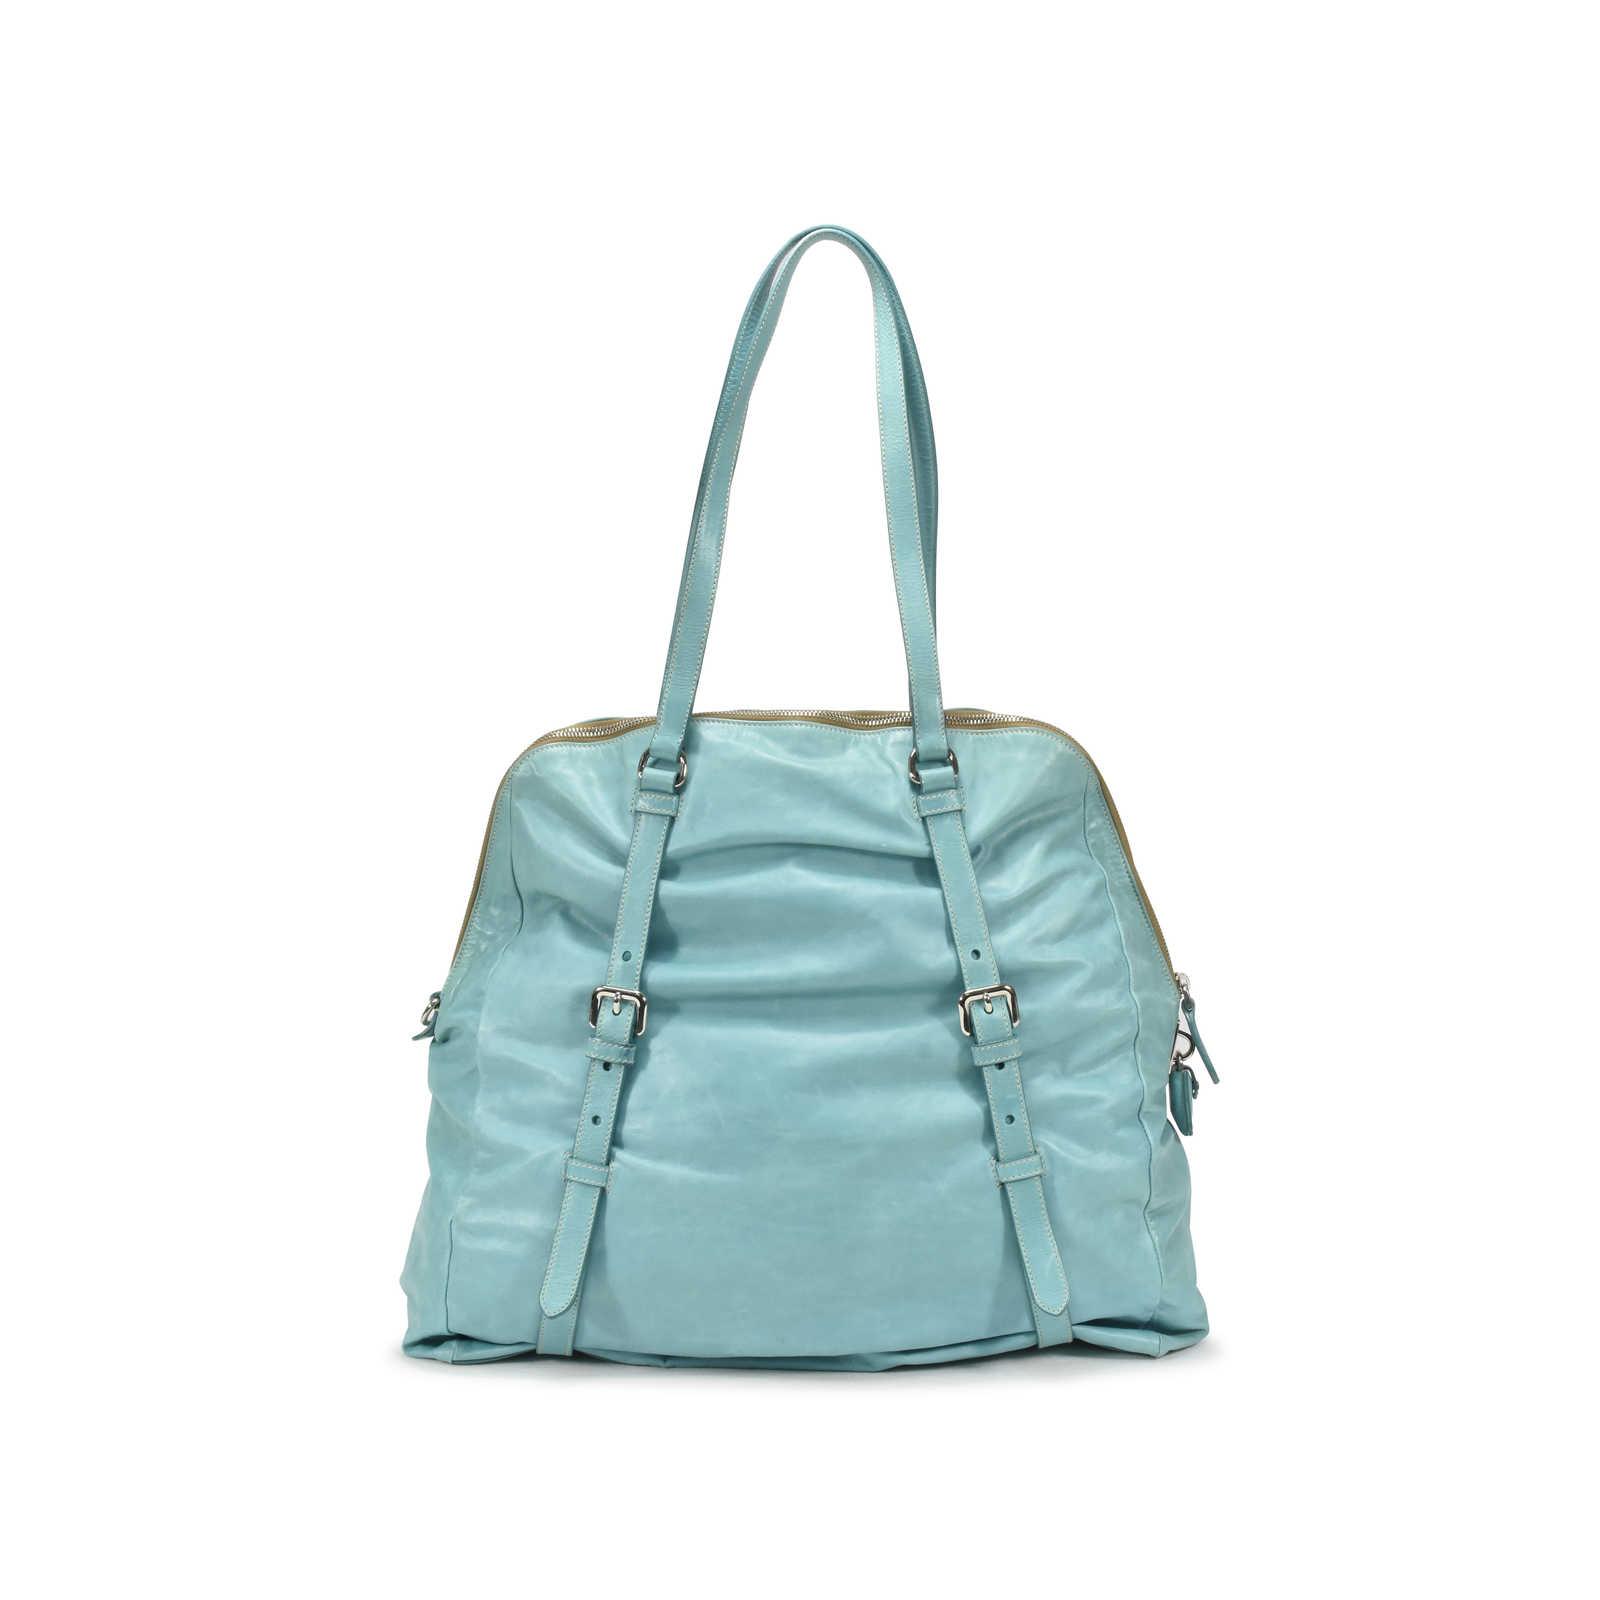 c1c3cf866924 ... Authentic Second Hand Prada Dome Bag (PSS-126-00016) - Thumbnail 1 ...